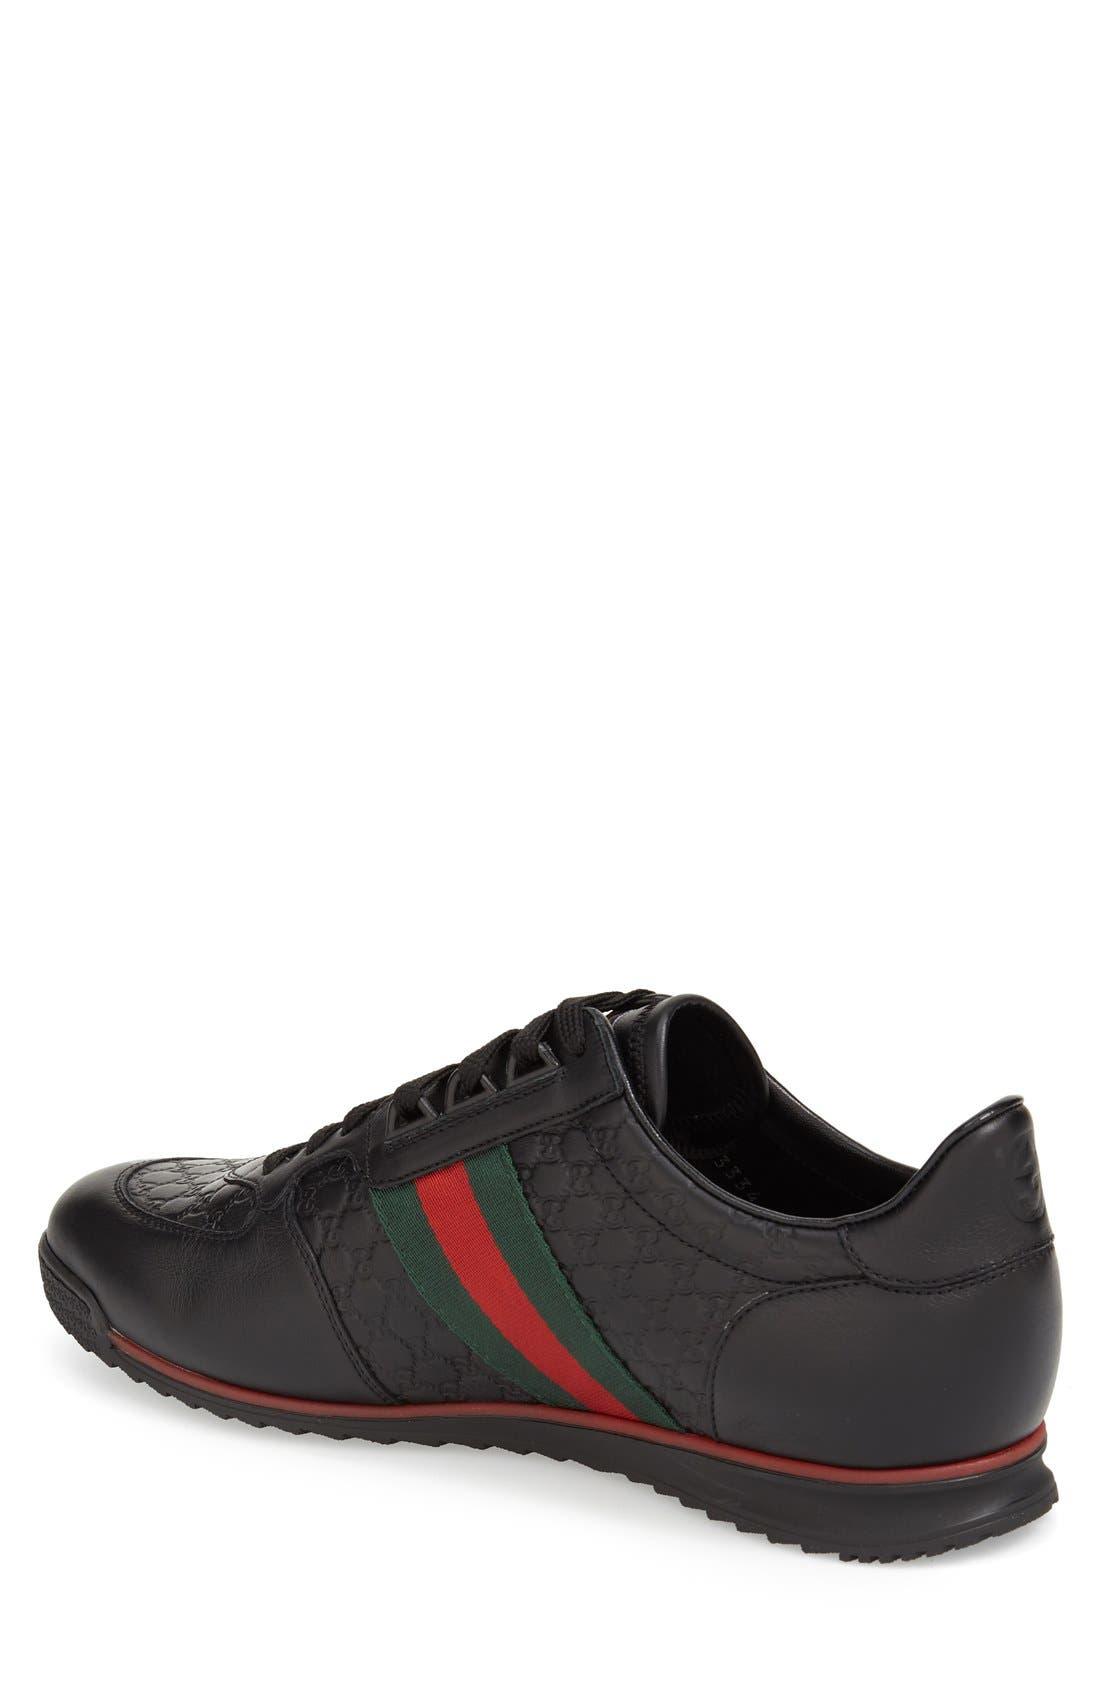 SL 73 Sneaker,                             Alternate thumbnail 4, color,                             BLACK